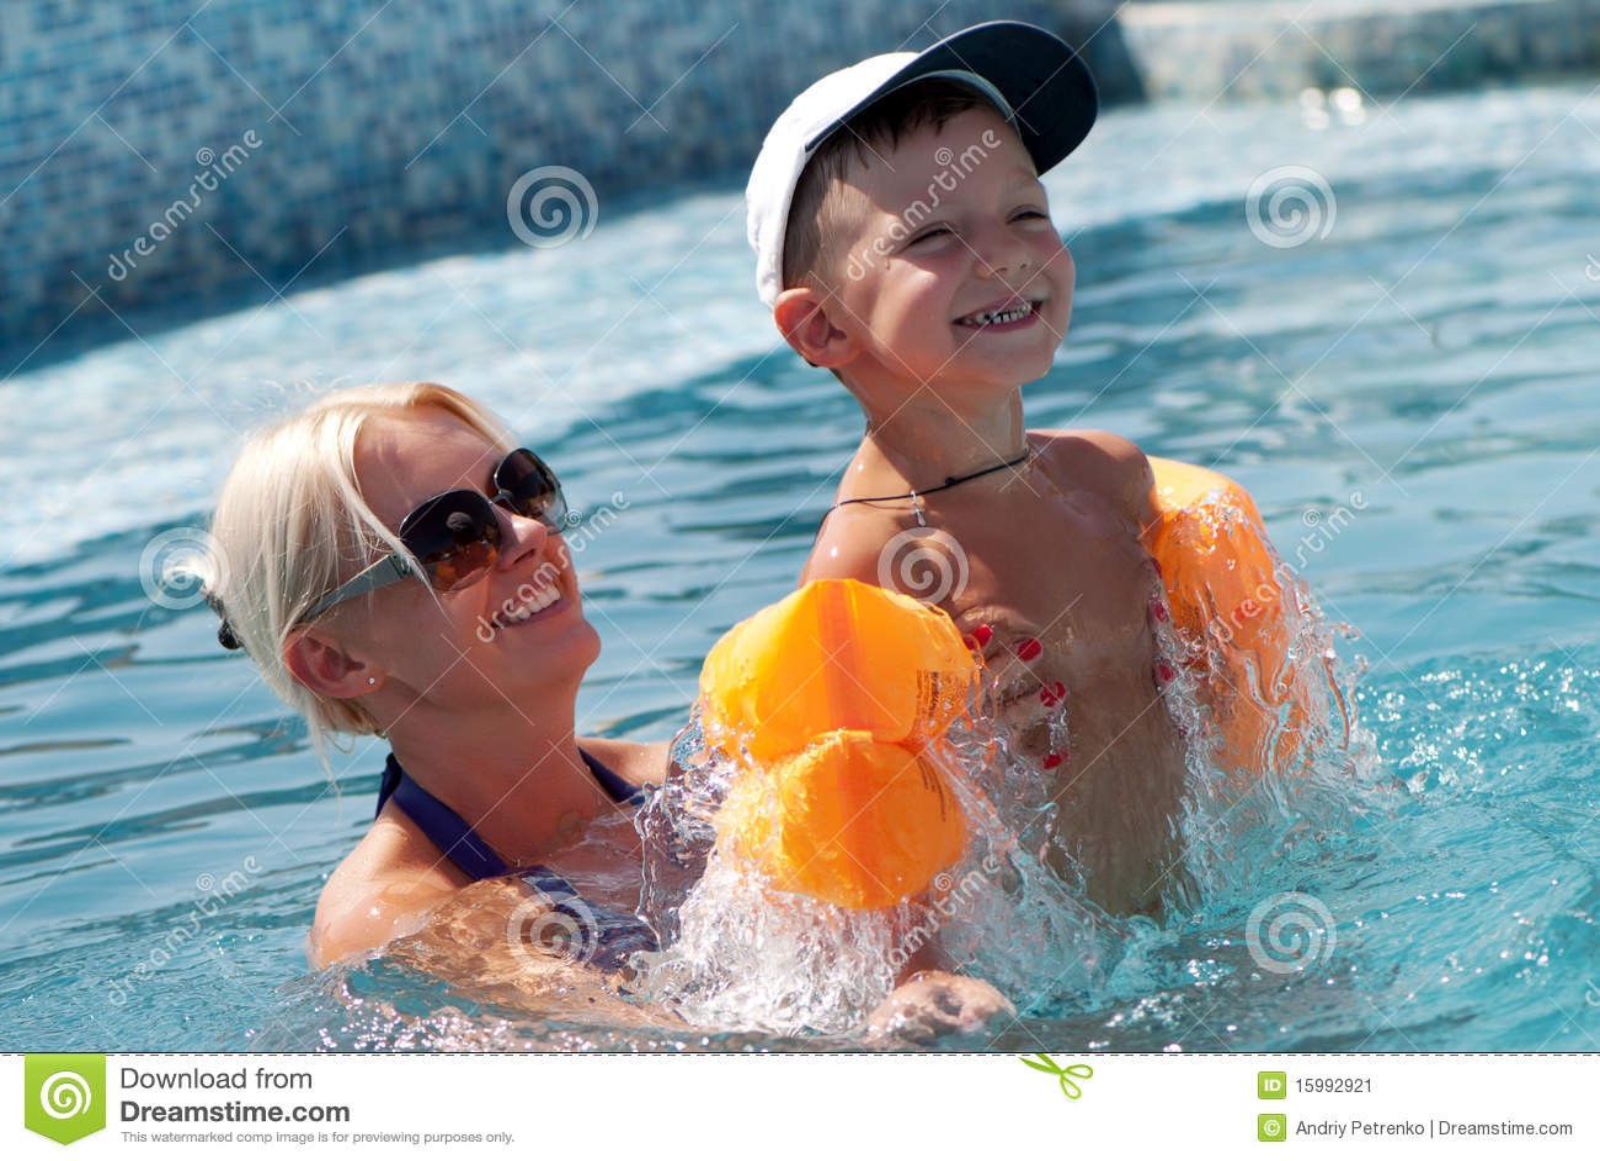 boy bathes with woman